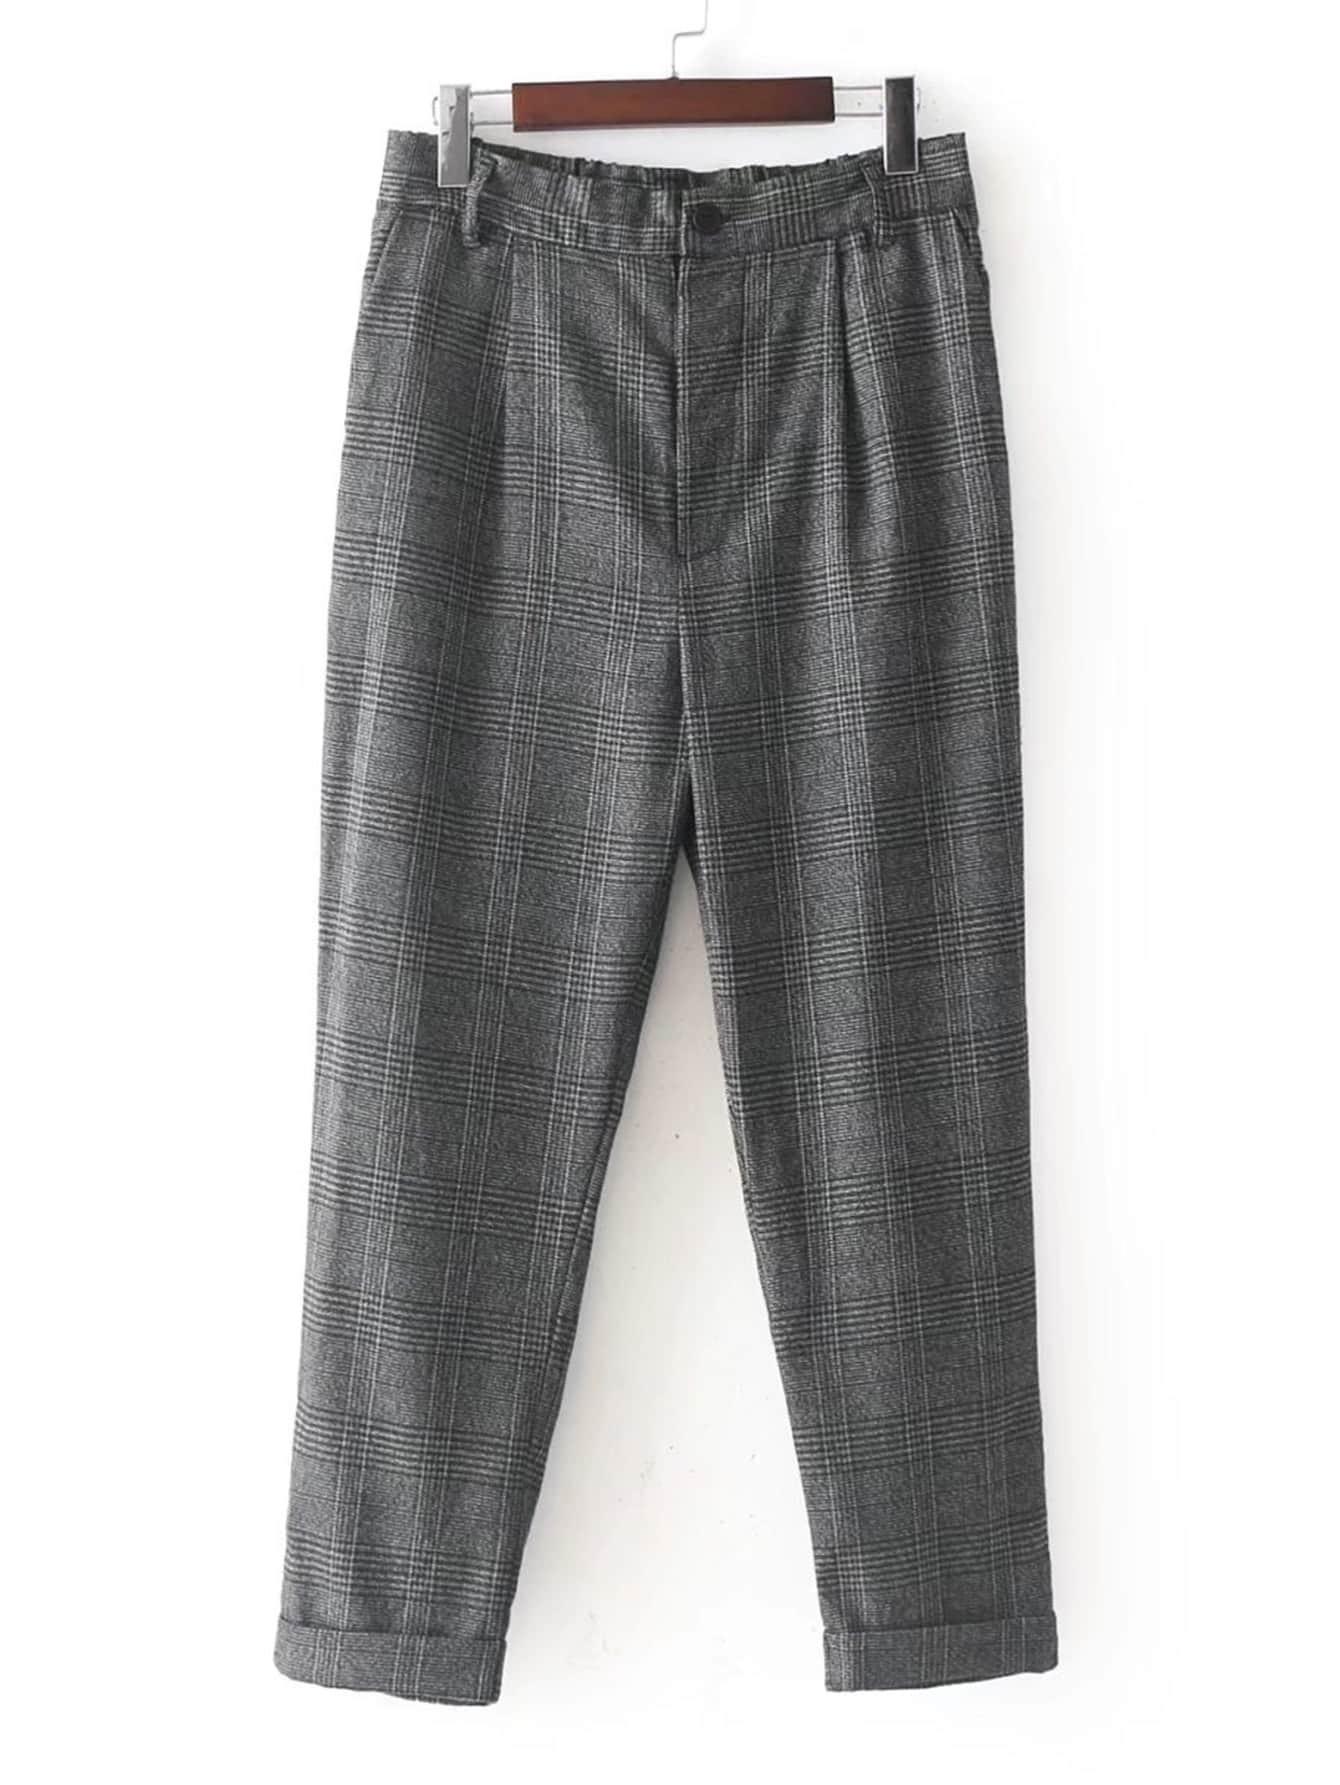 Image of Glen Plaid Cuffed Pants